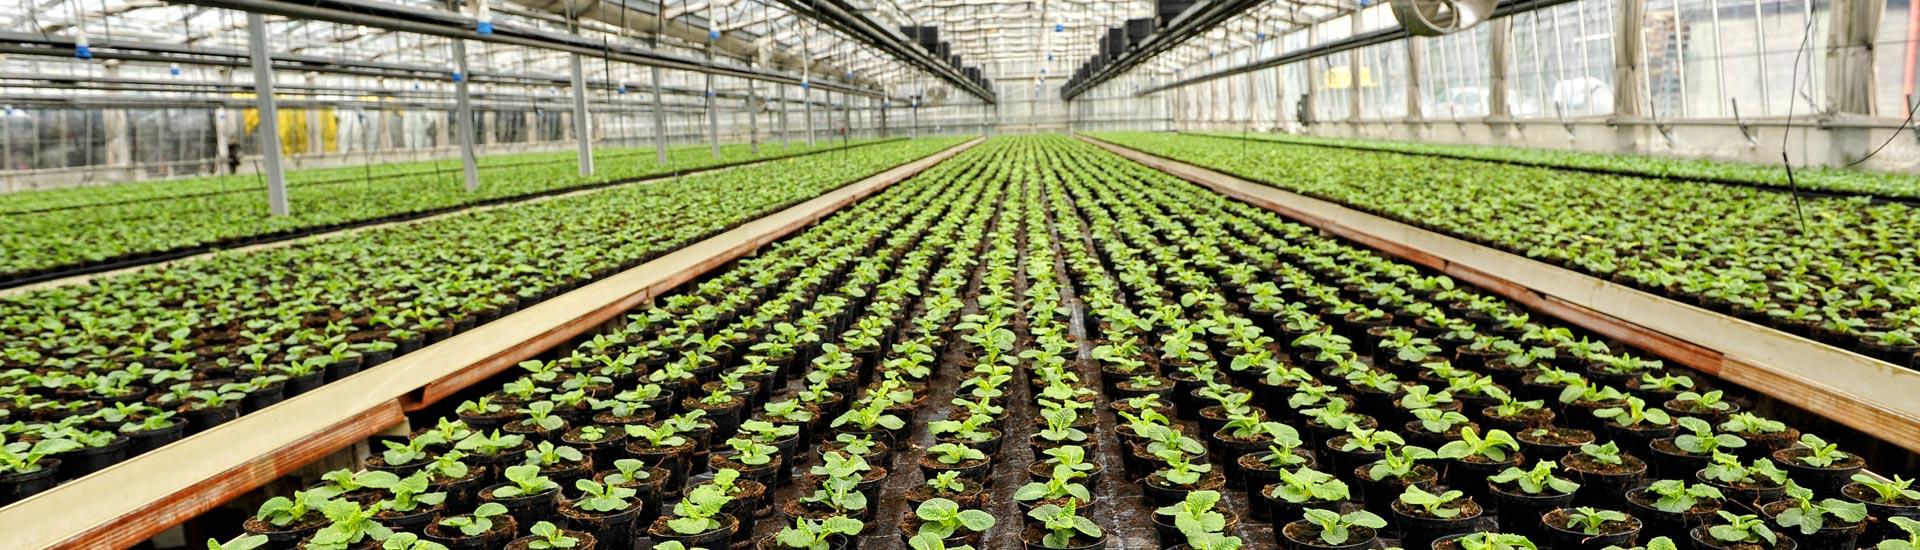 Greenhouse Humidity Control